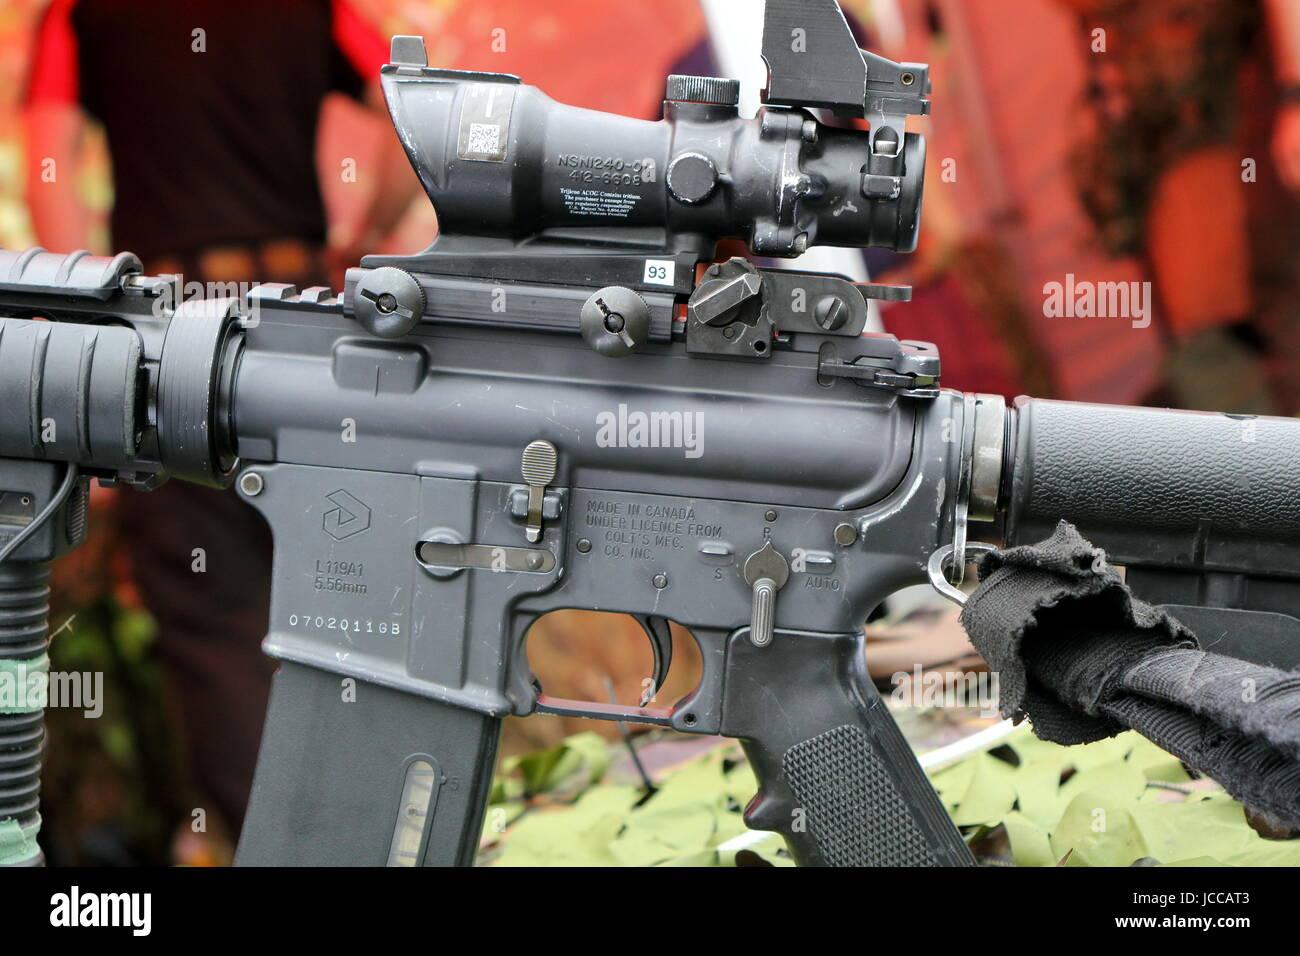 Beaulieu, Hampshire, UK - May 29 2017: Closeup of Colt Canada C8 Carbine L119A1 Stock Photo